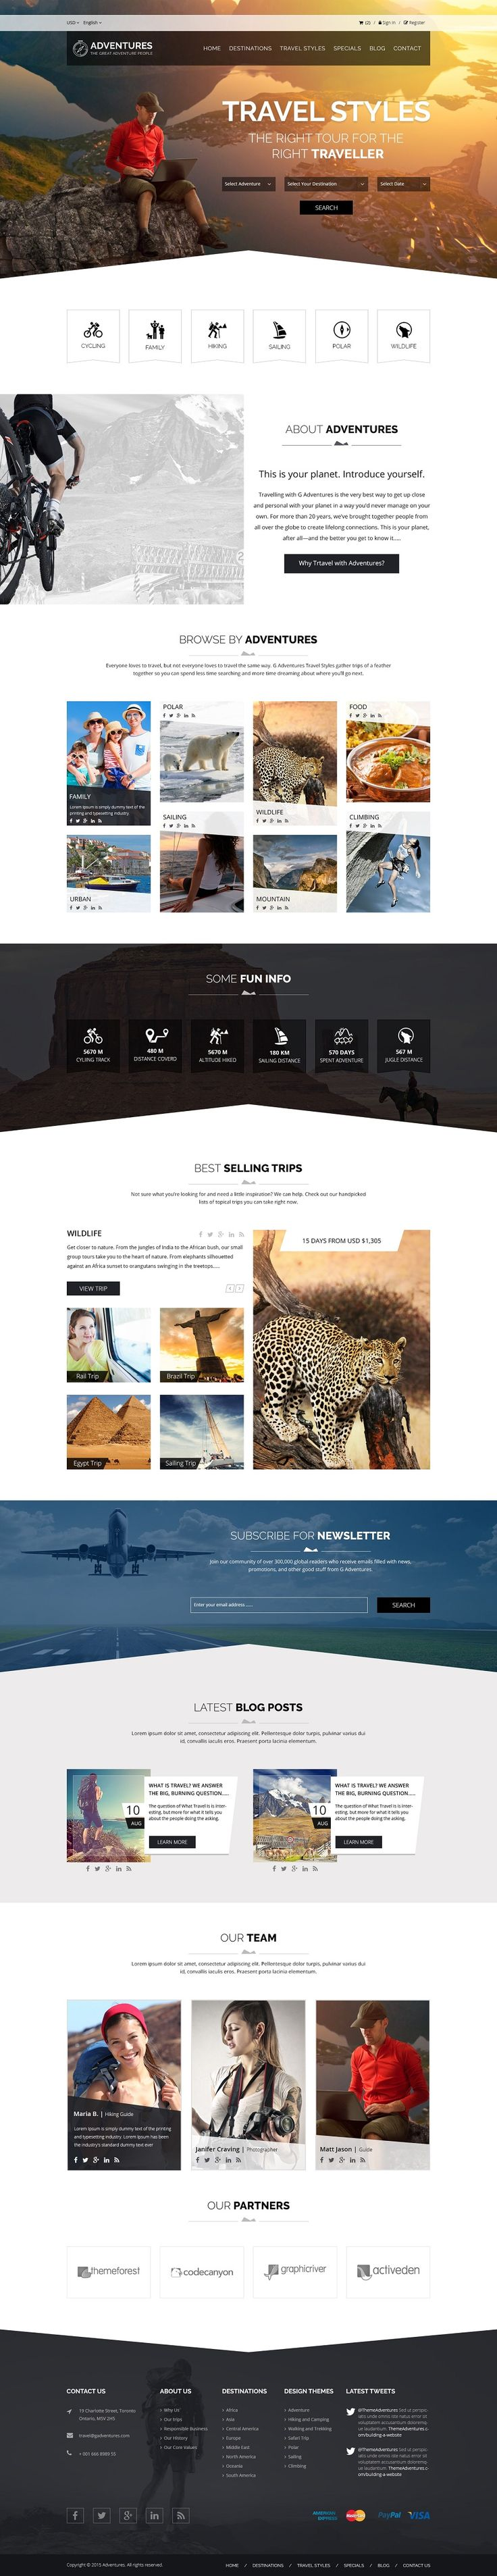 Best Travel WordPress Themes #DESIGN #WEB